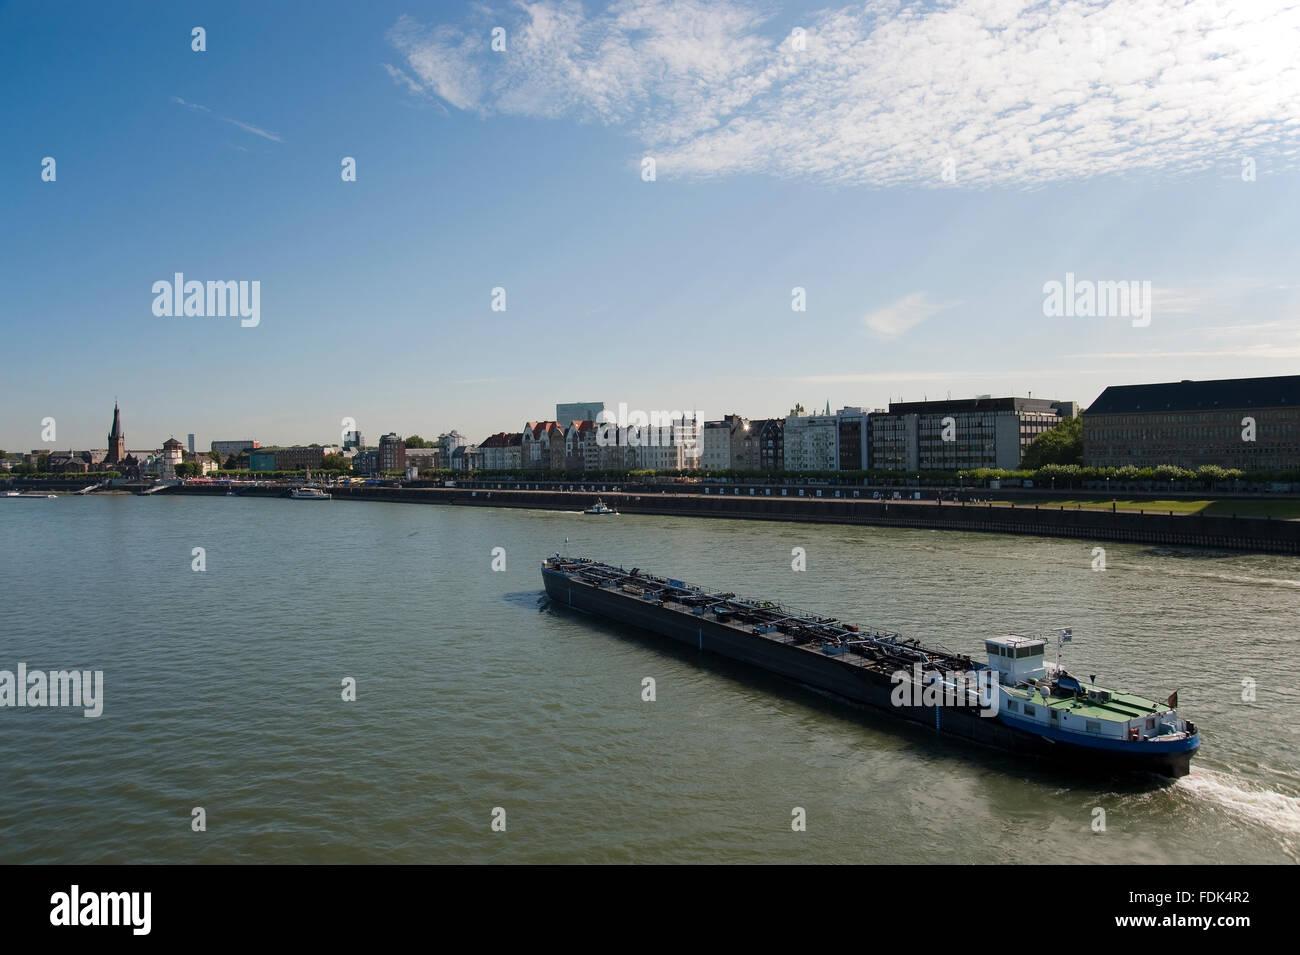 düsseldorf,rhine river,water transport - Stock Image